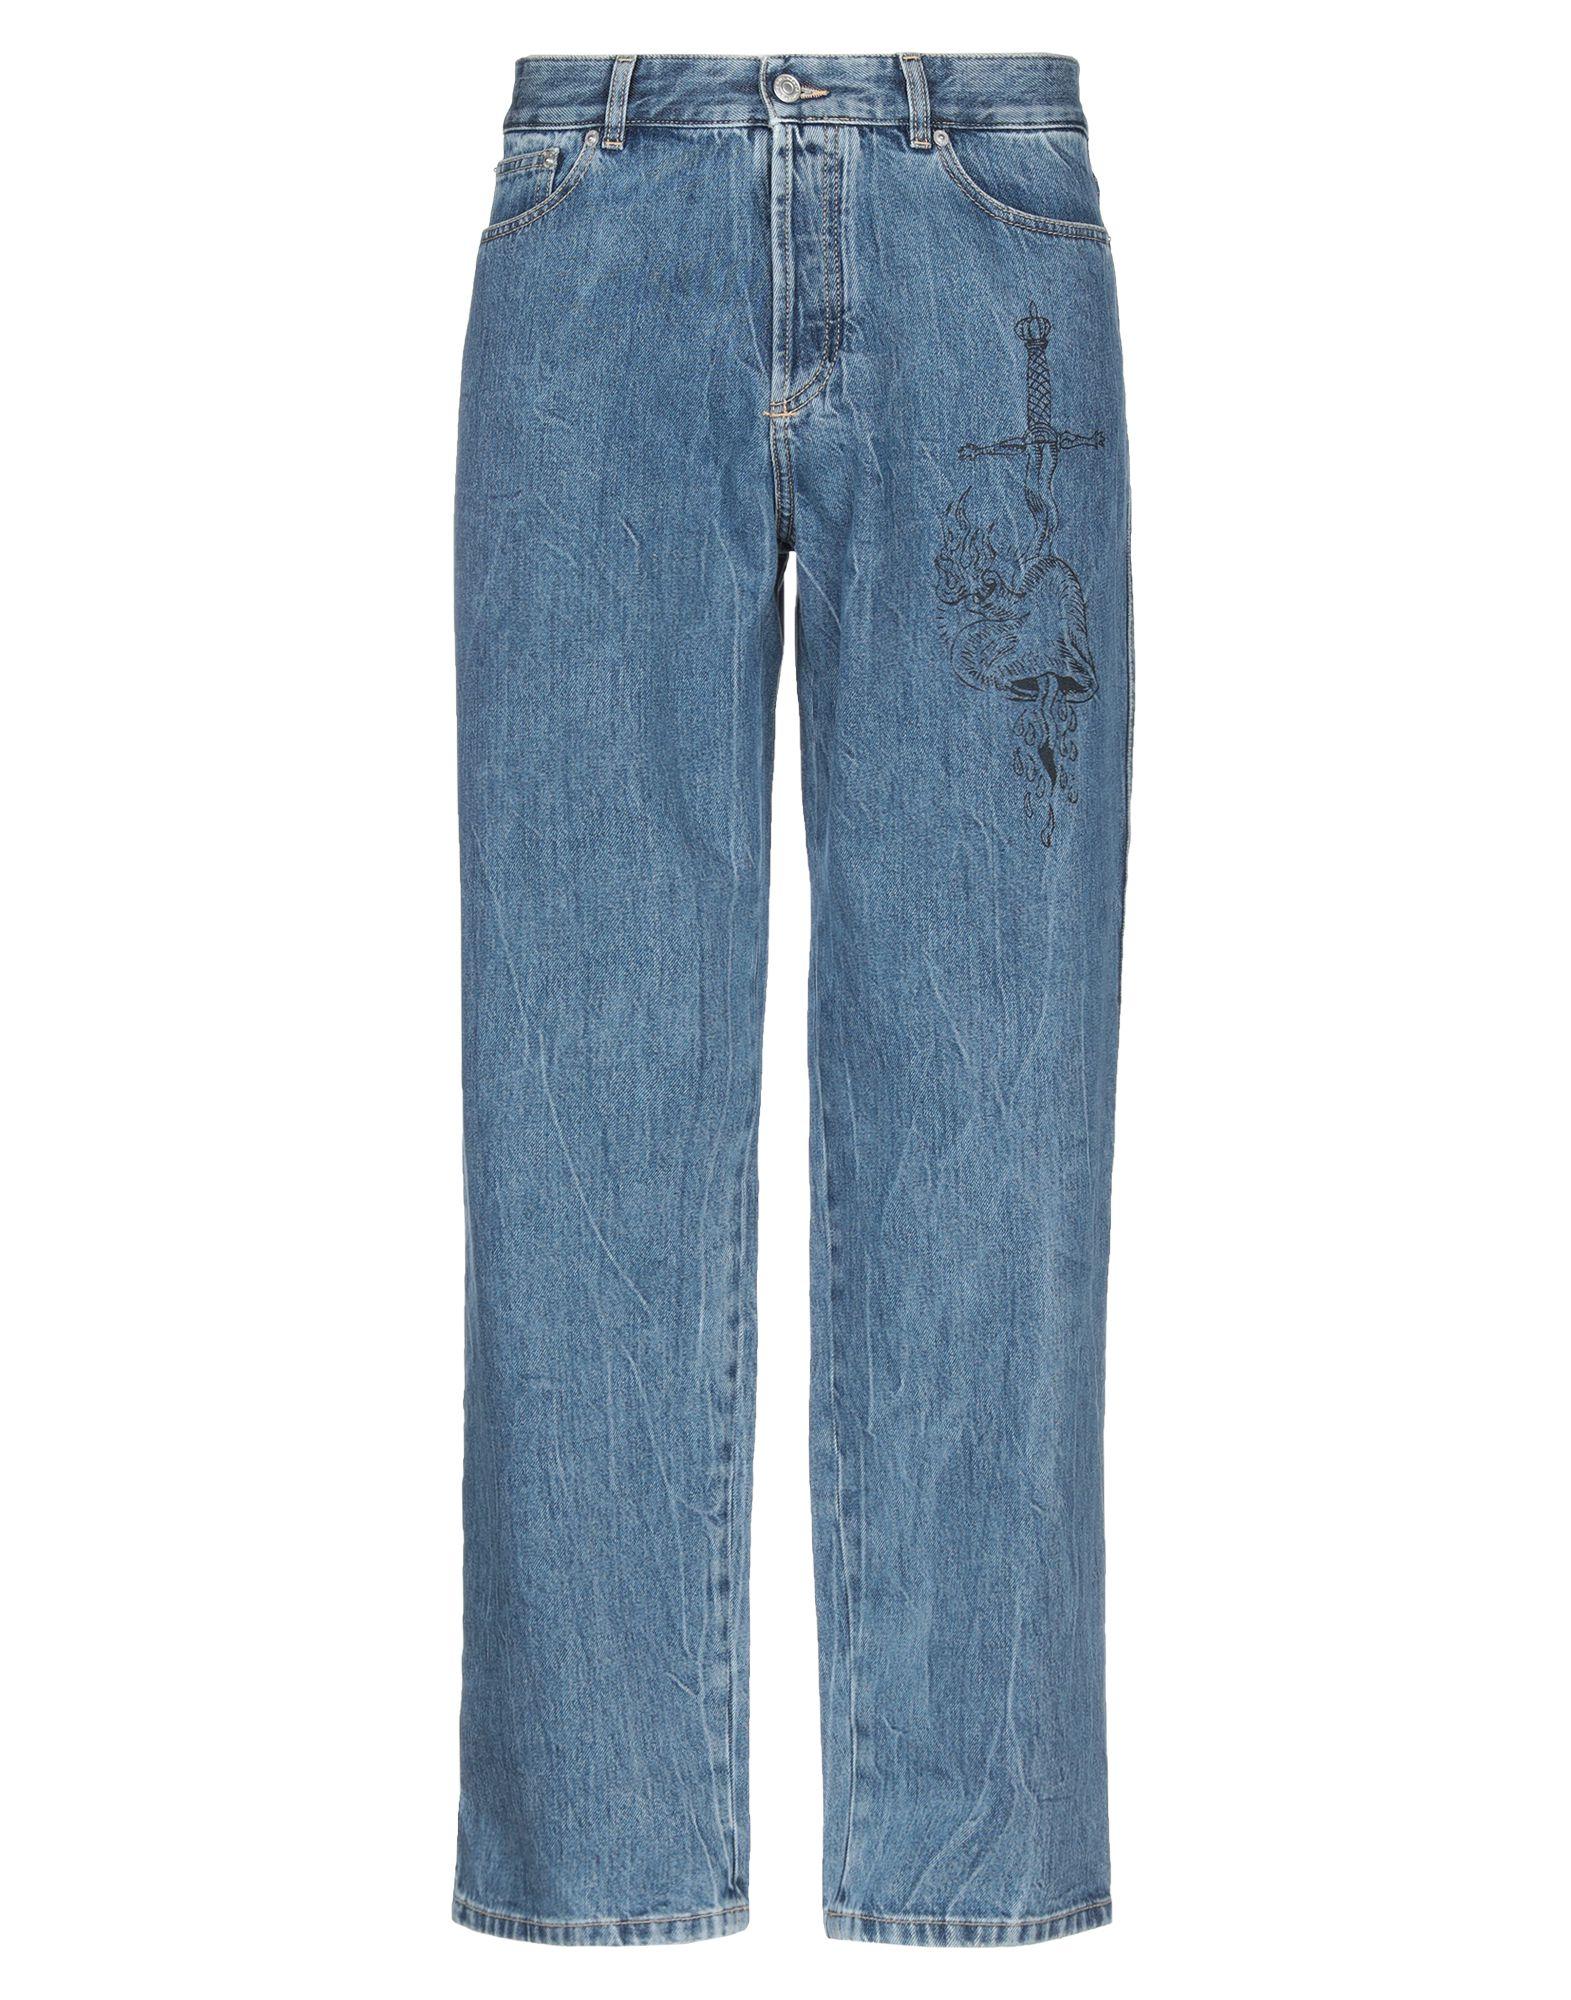 GIVENCHY Denim pants - Item 42809770